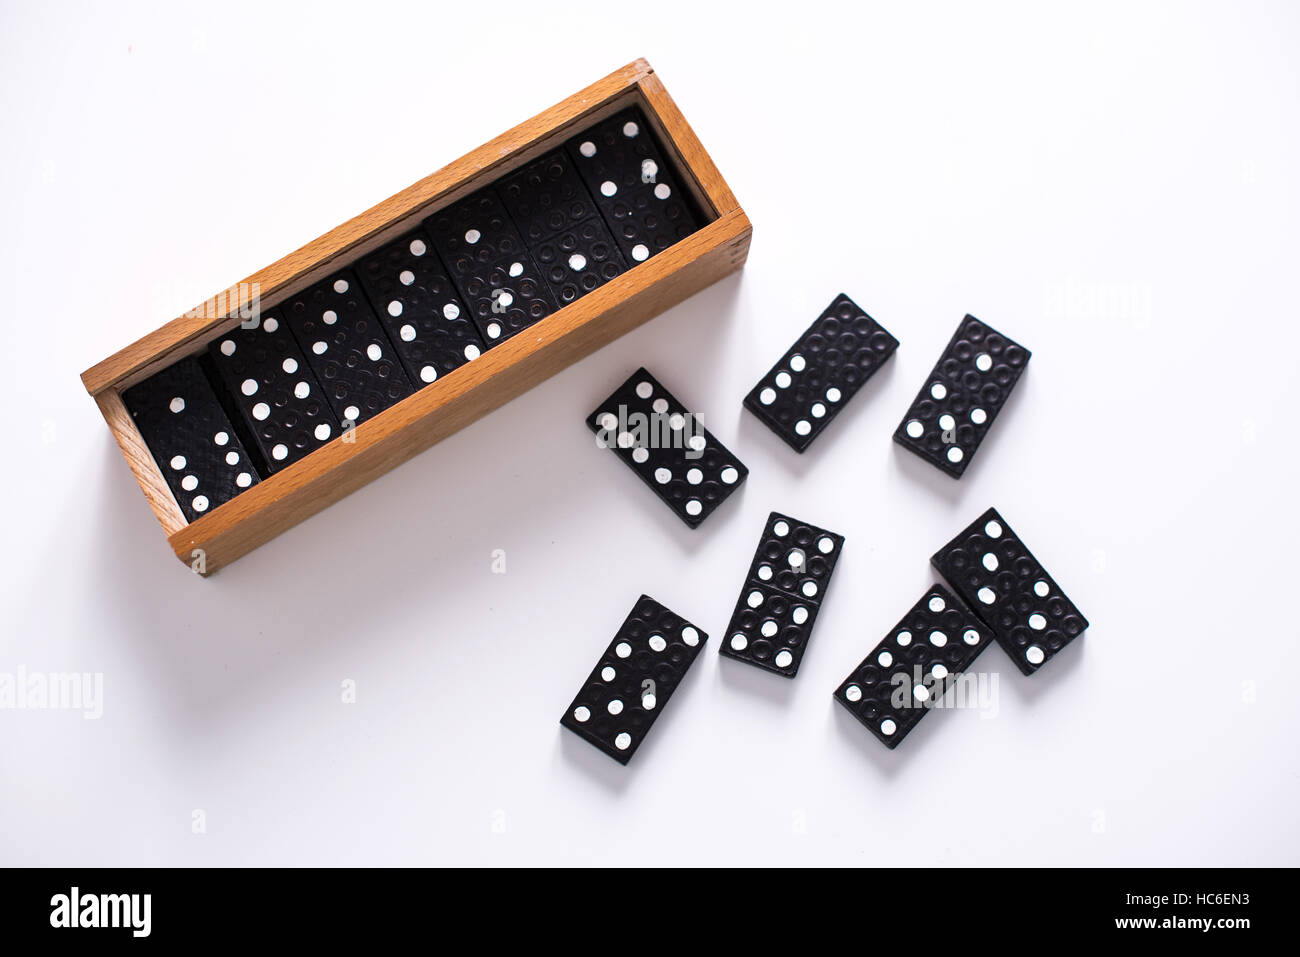 Domino Series Stock Photos & Domino Series Stock Images - Alamy